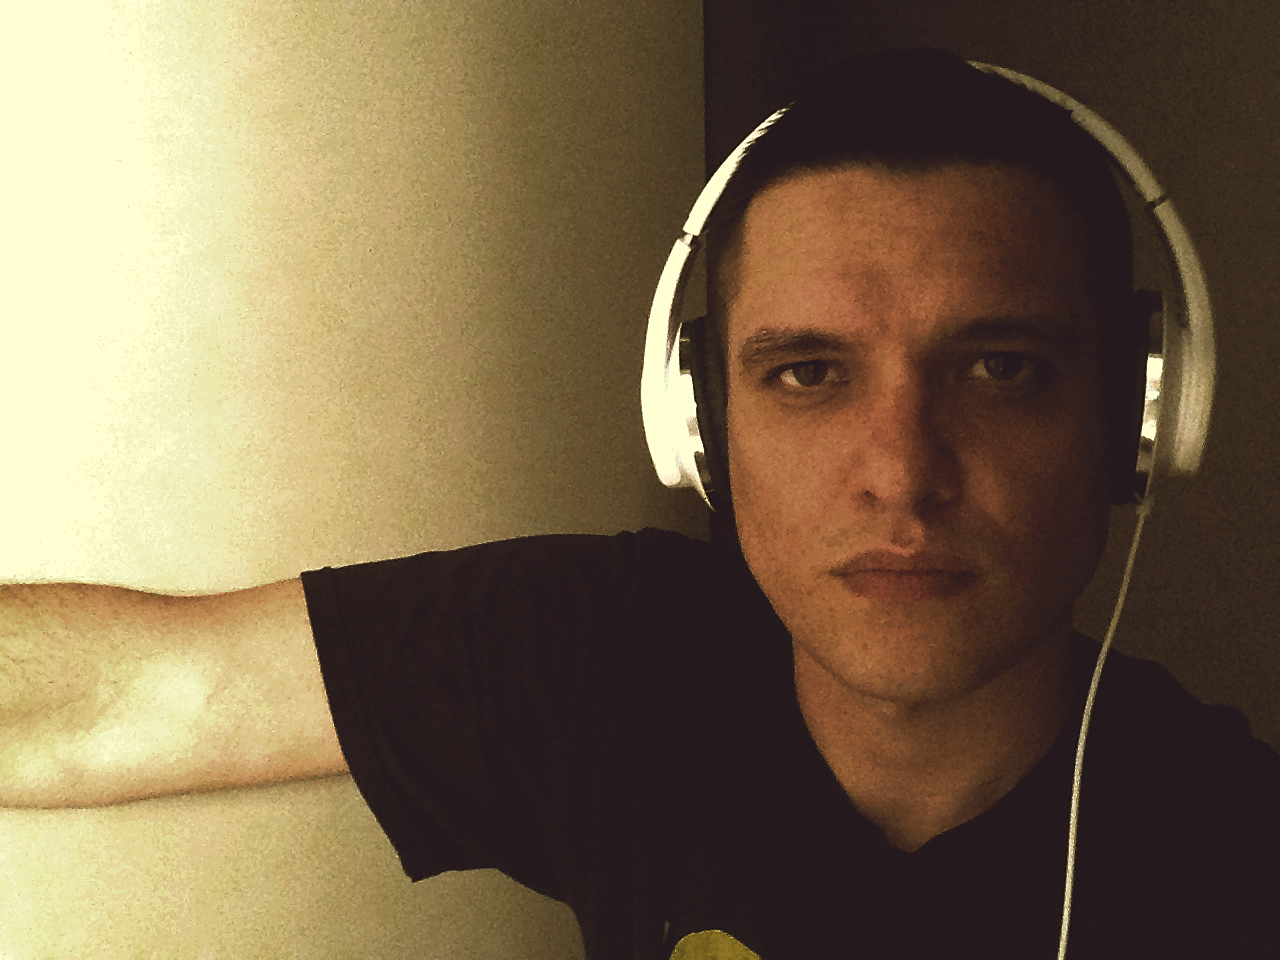 K.Mac / Kyle Mac / Kyle McMahon with Flips Audio Headphones